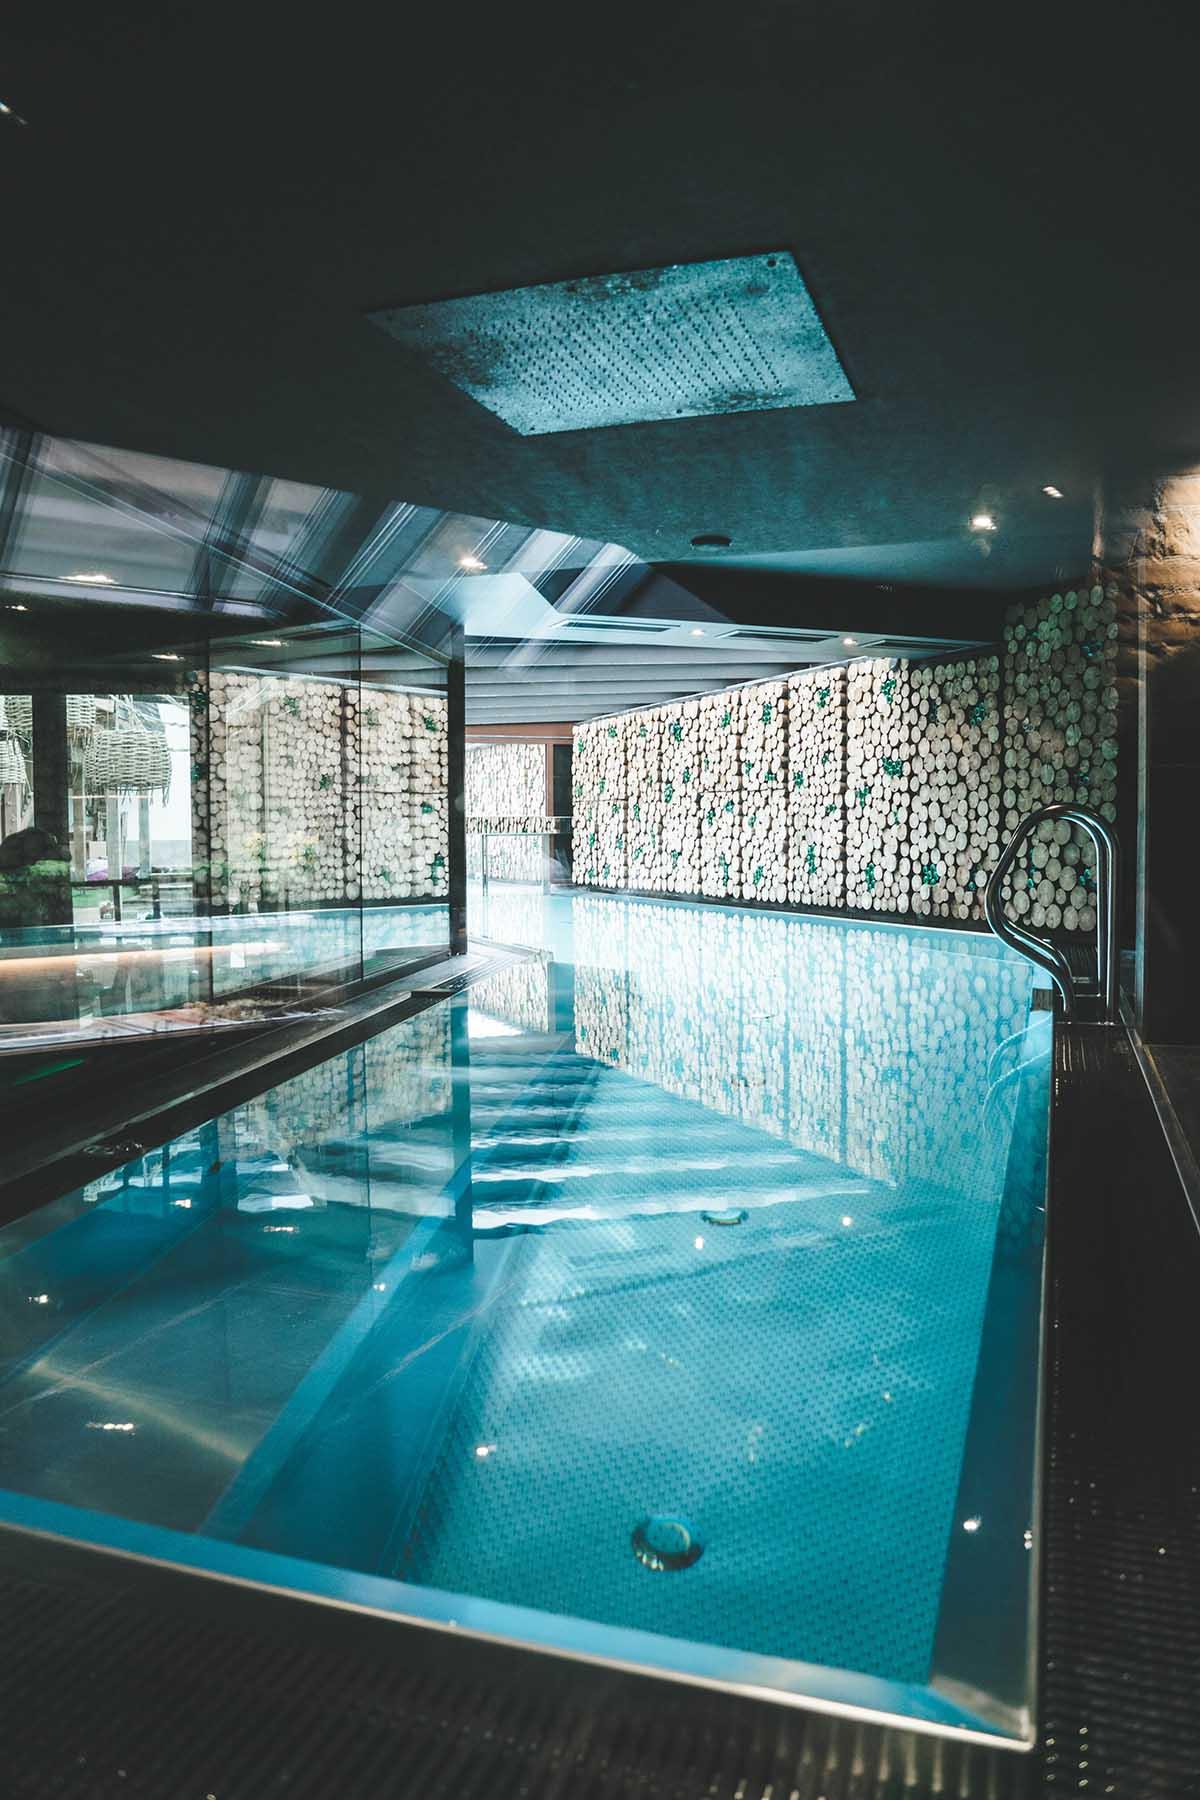 hochkoenig-lifestyle-hotel-eder-maria-alm-pool